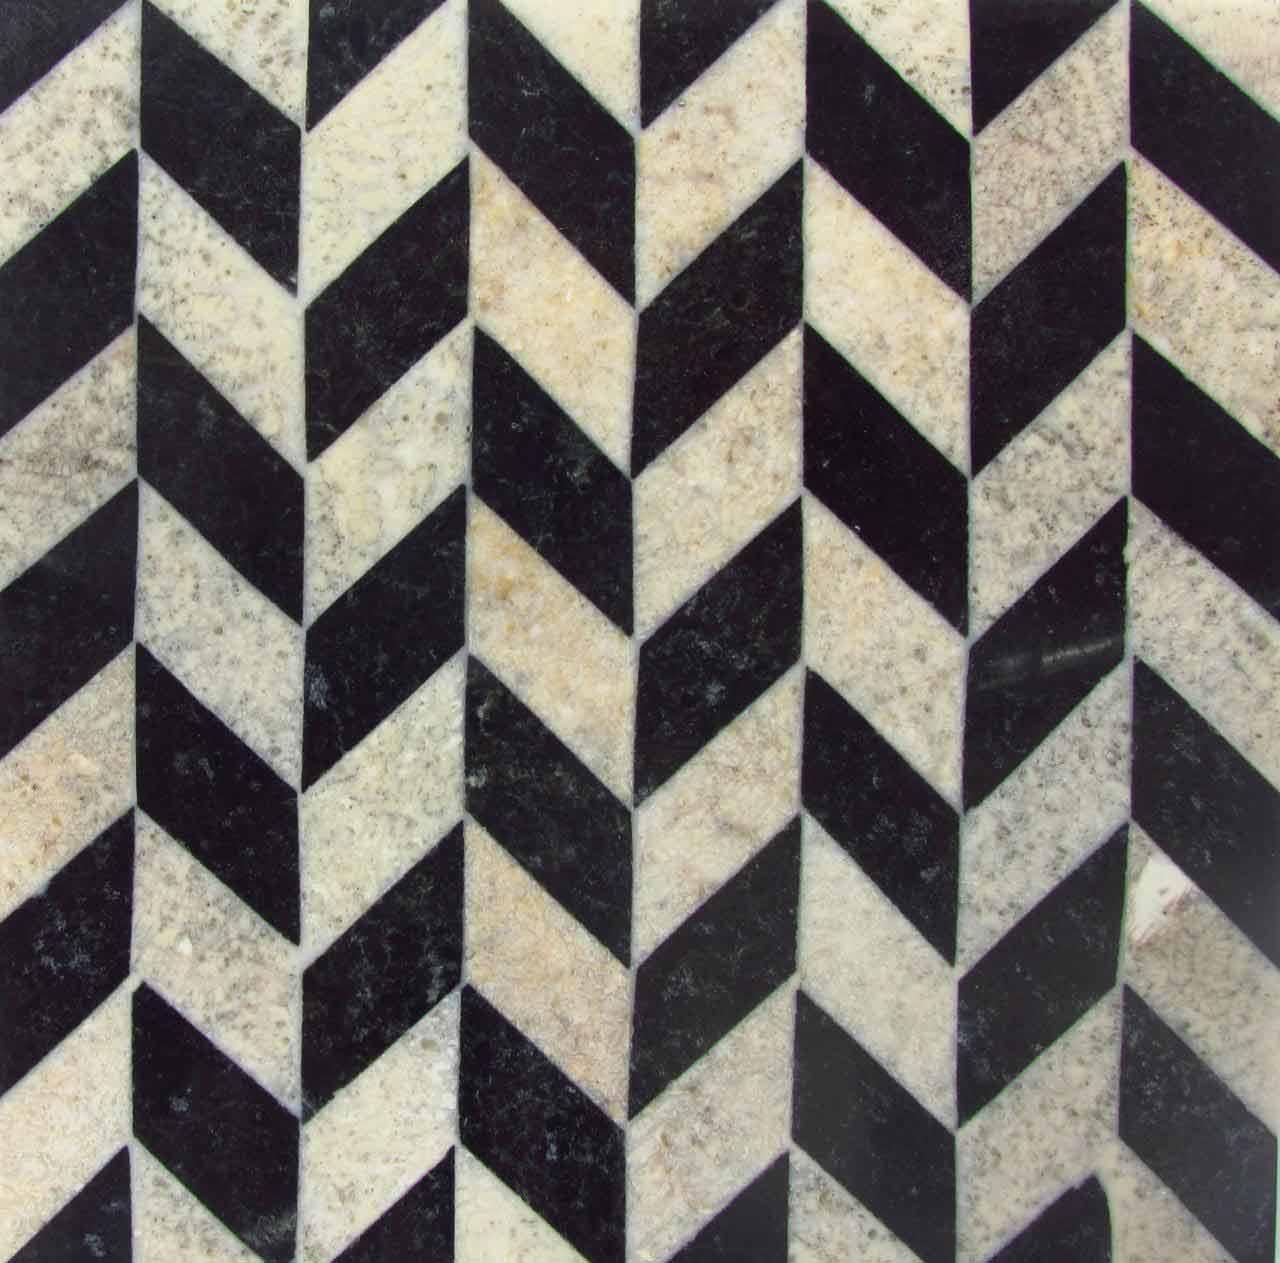 Chevron Stone Pattern